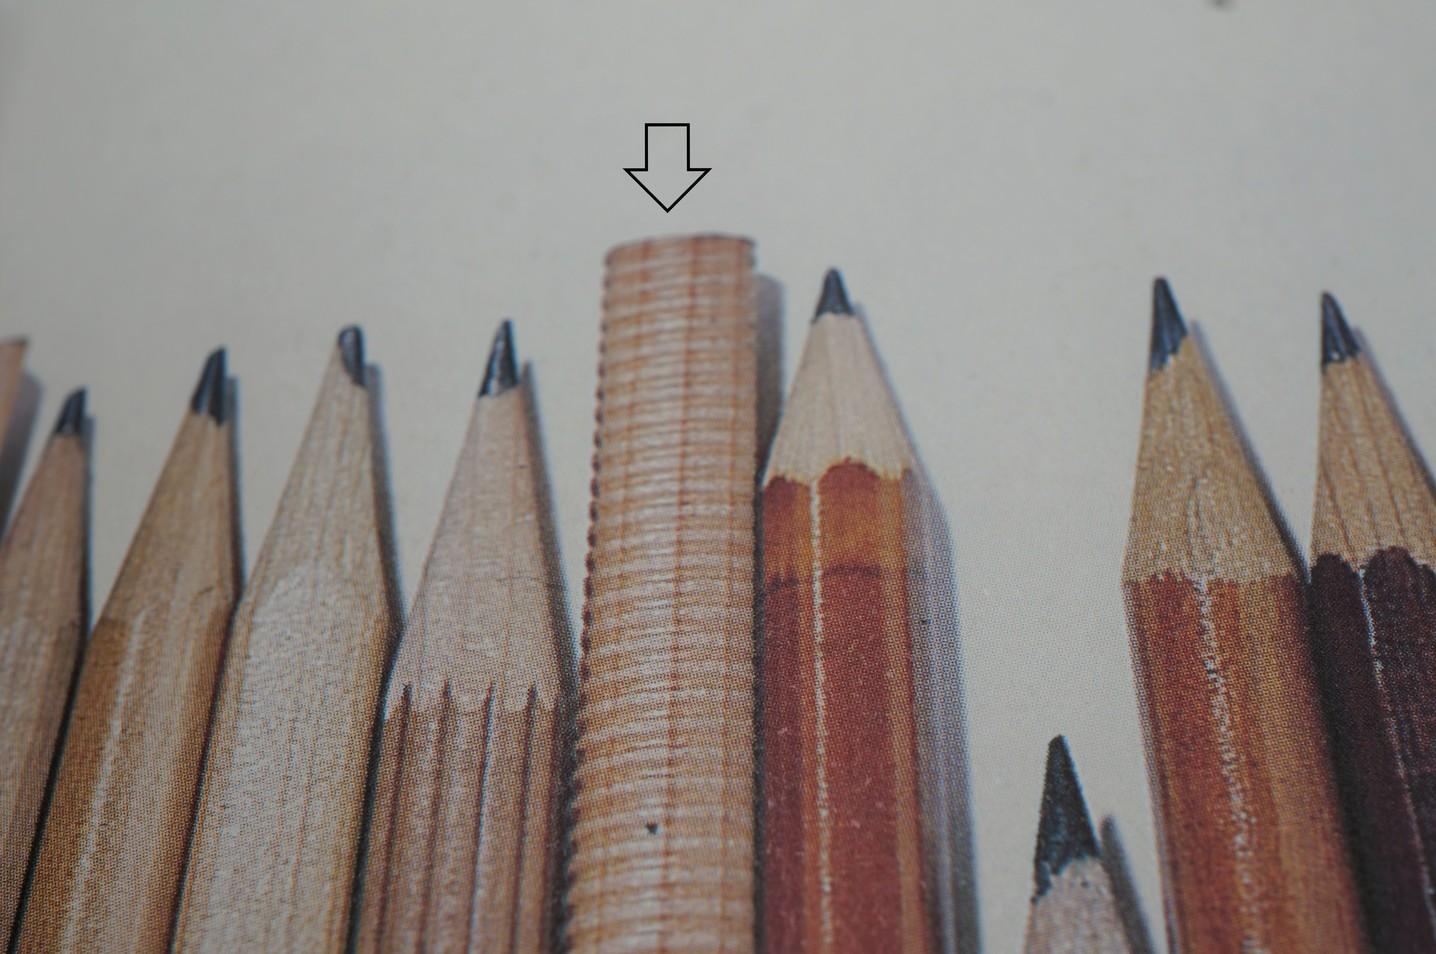 Musgrave Single Barrel 106 pencil